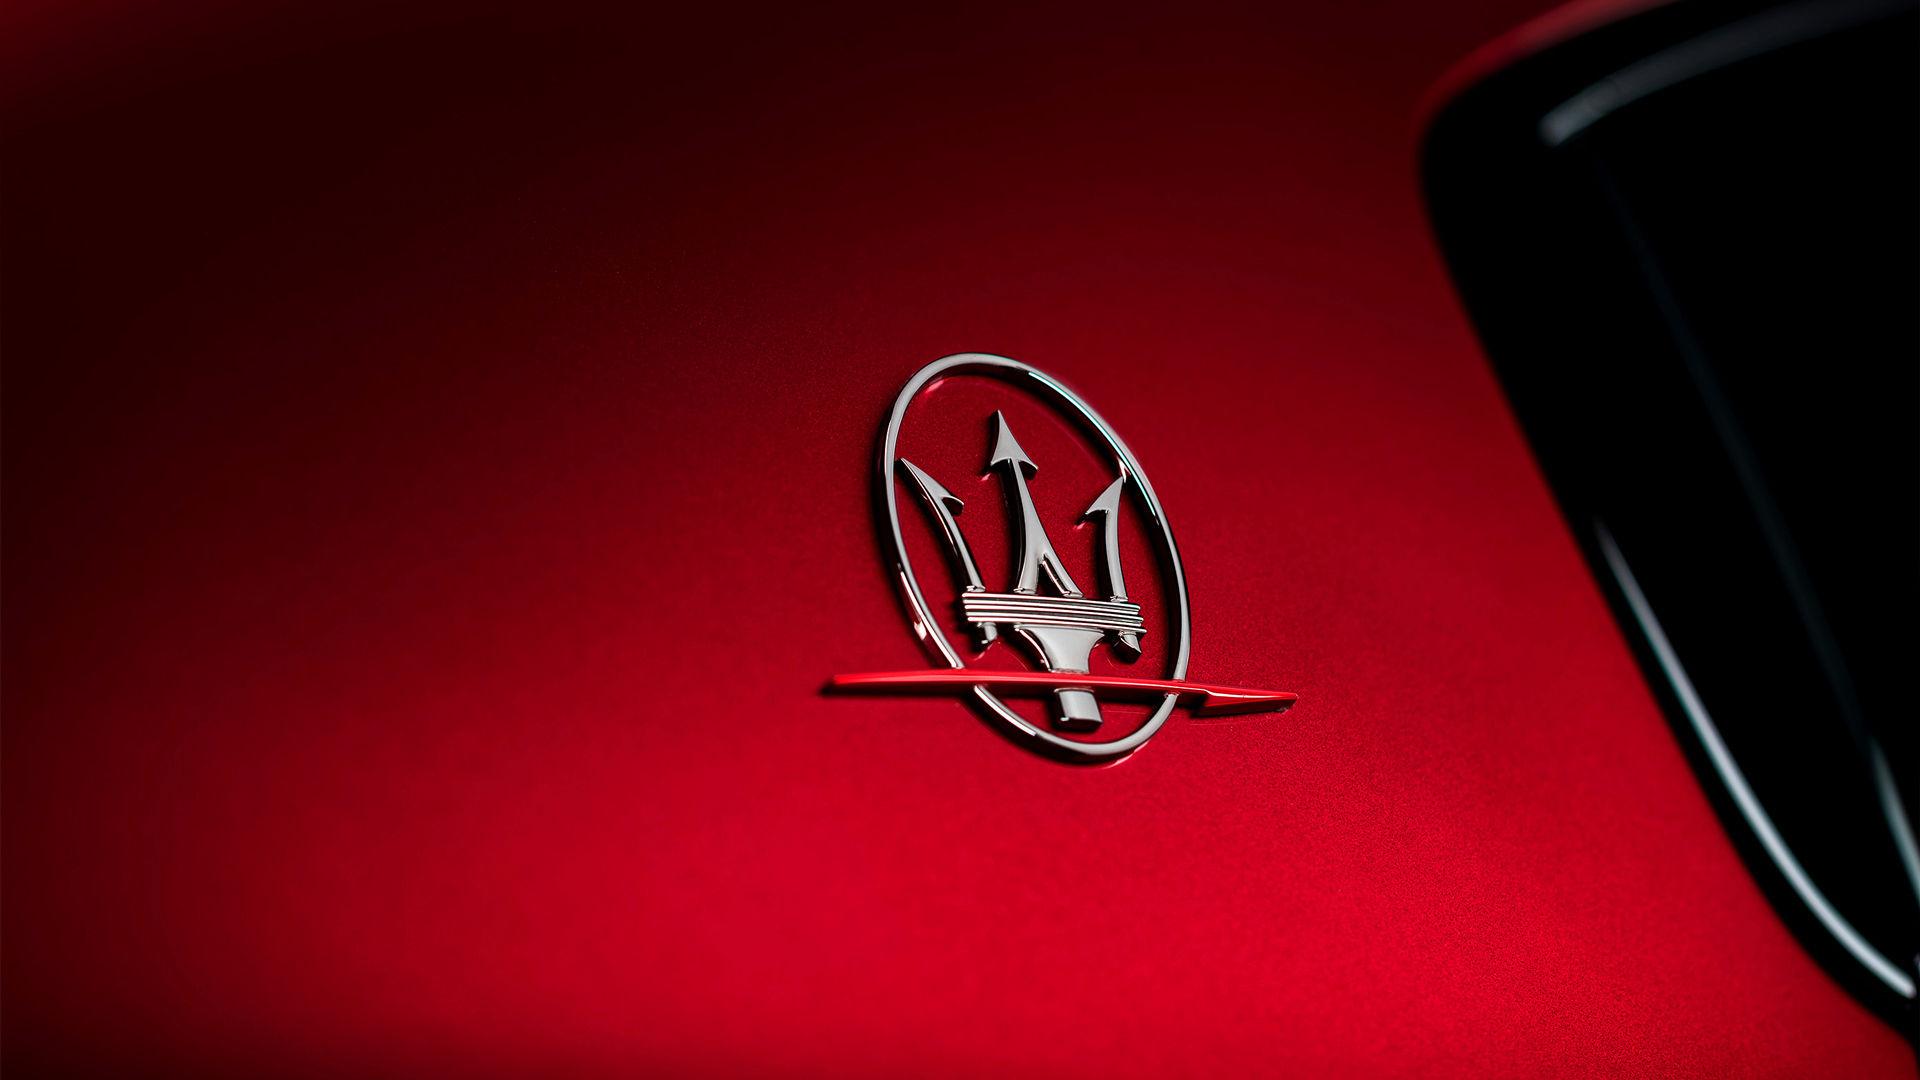 Maserati Ghibli Trofeo - Dreizack Logo